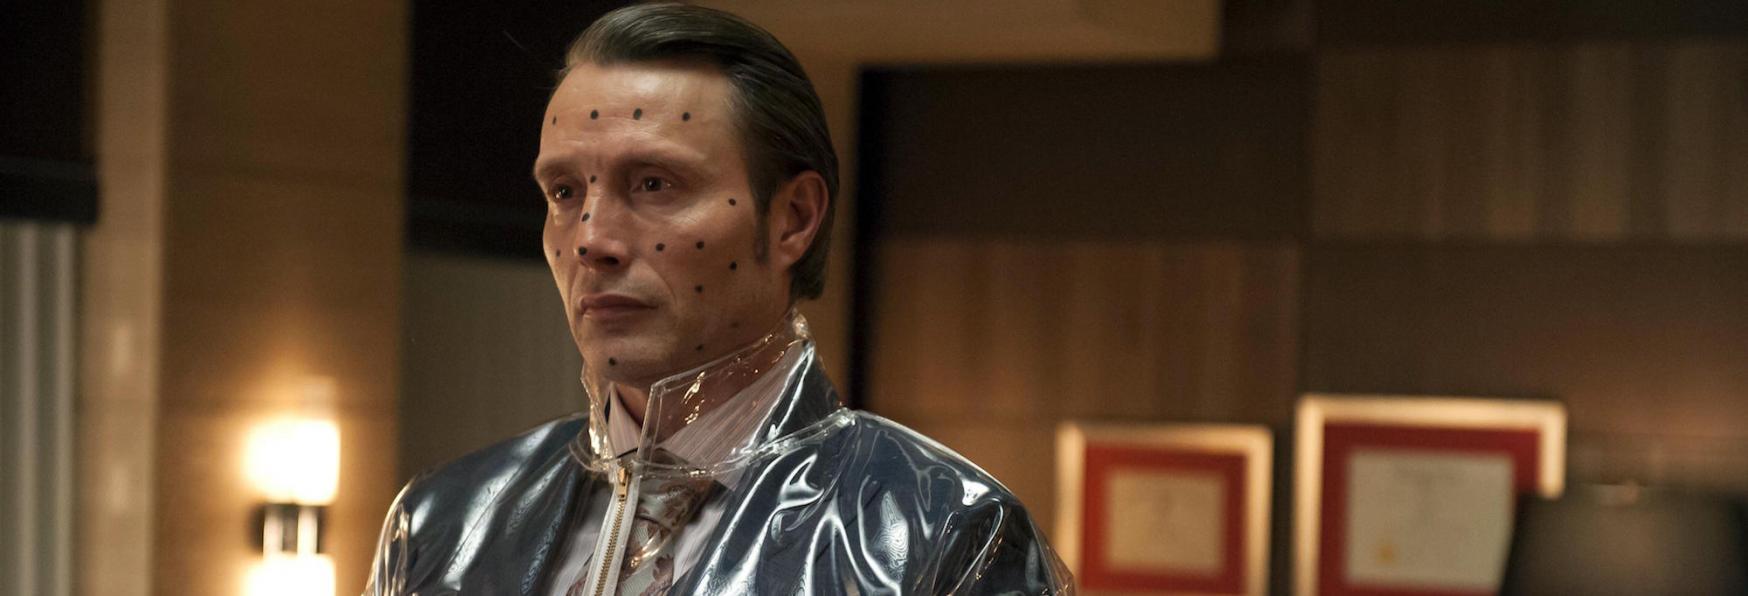 Hannibal: l'amata Serie TV NBC avrà un Revival? Ecco i Dettagli